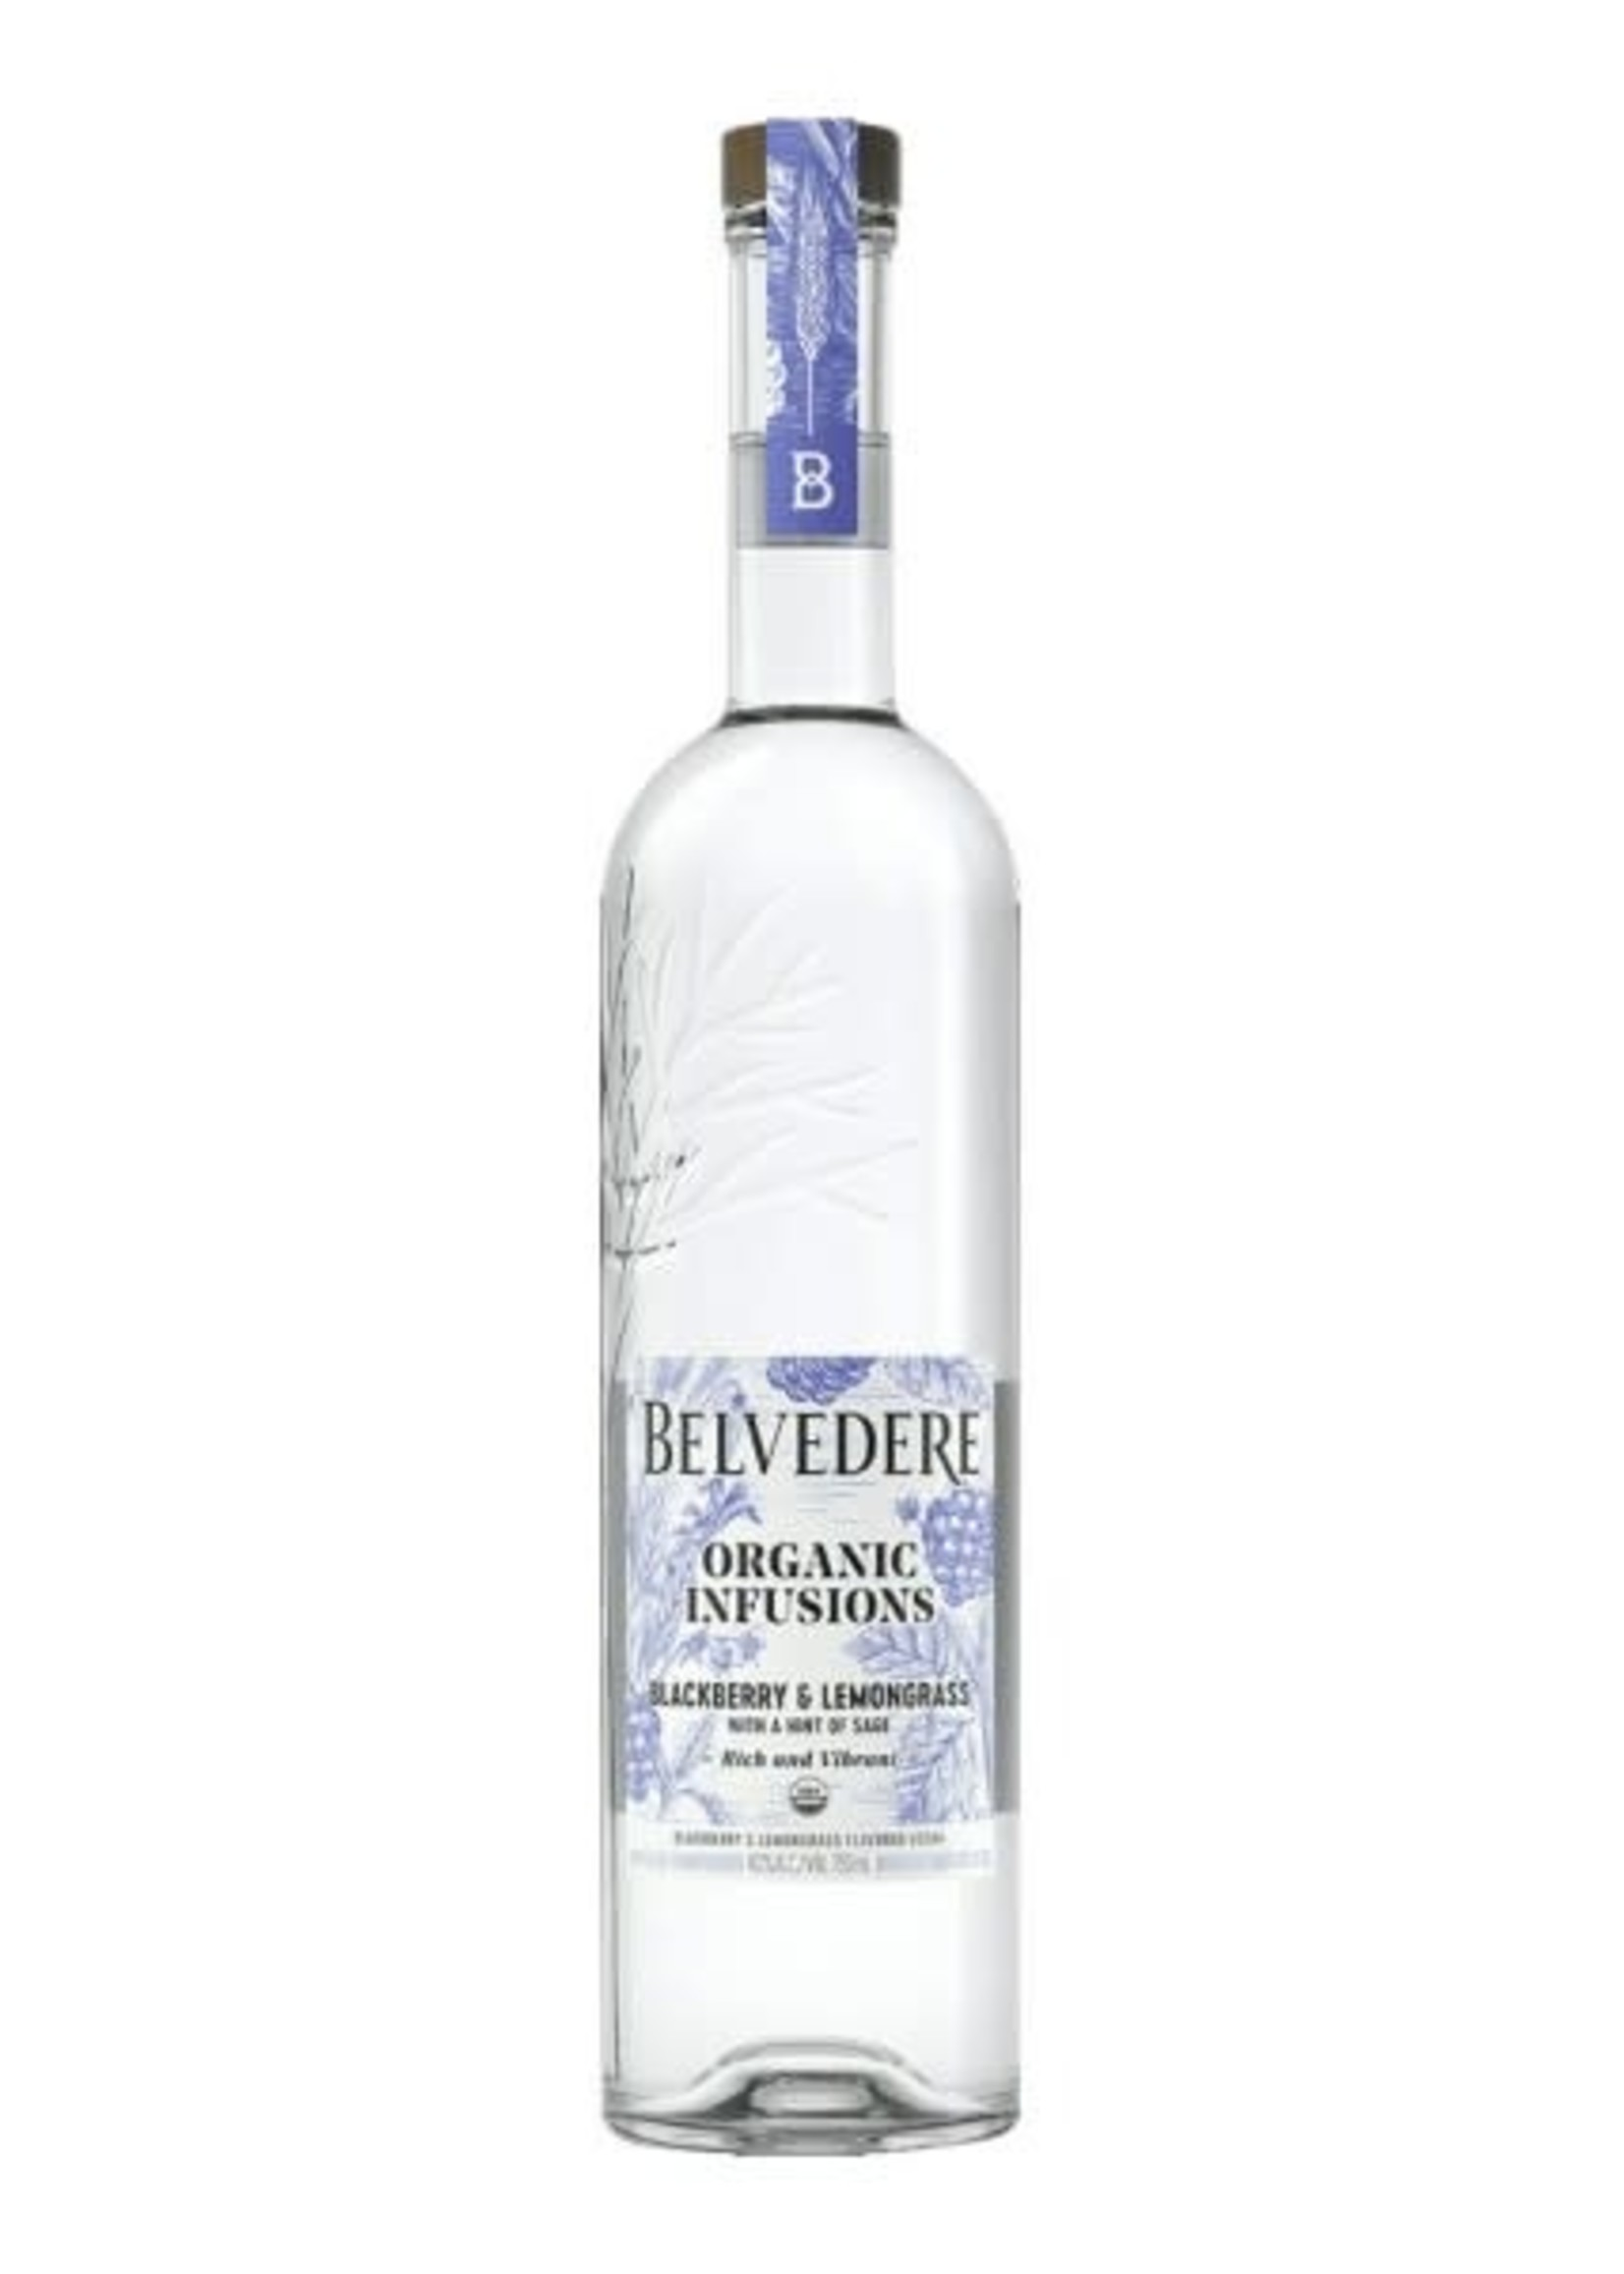 Belvedere Belvedere / Organic Infusions Blackberry & Lemongrass Flavored Vodka / 750mL